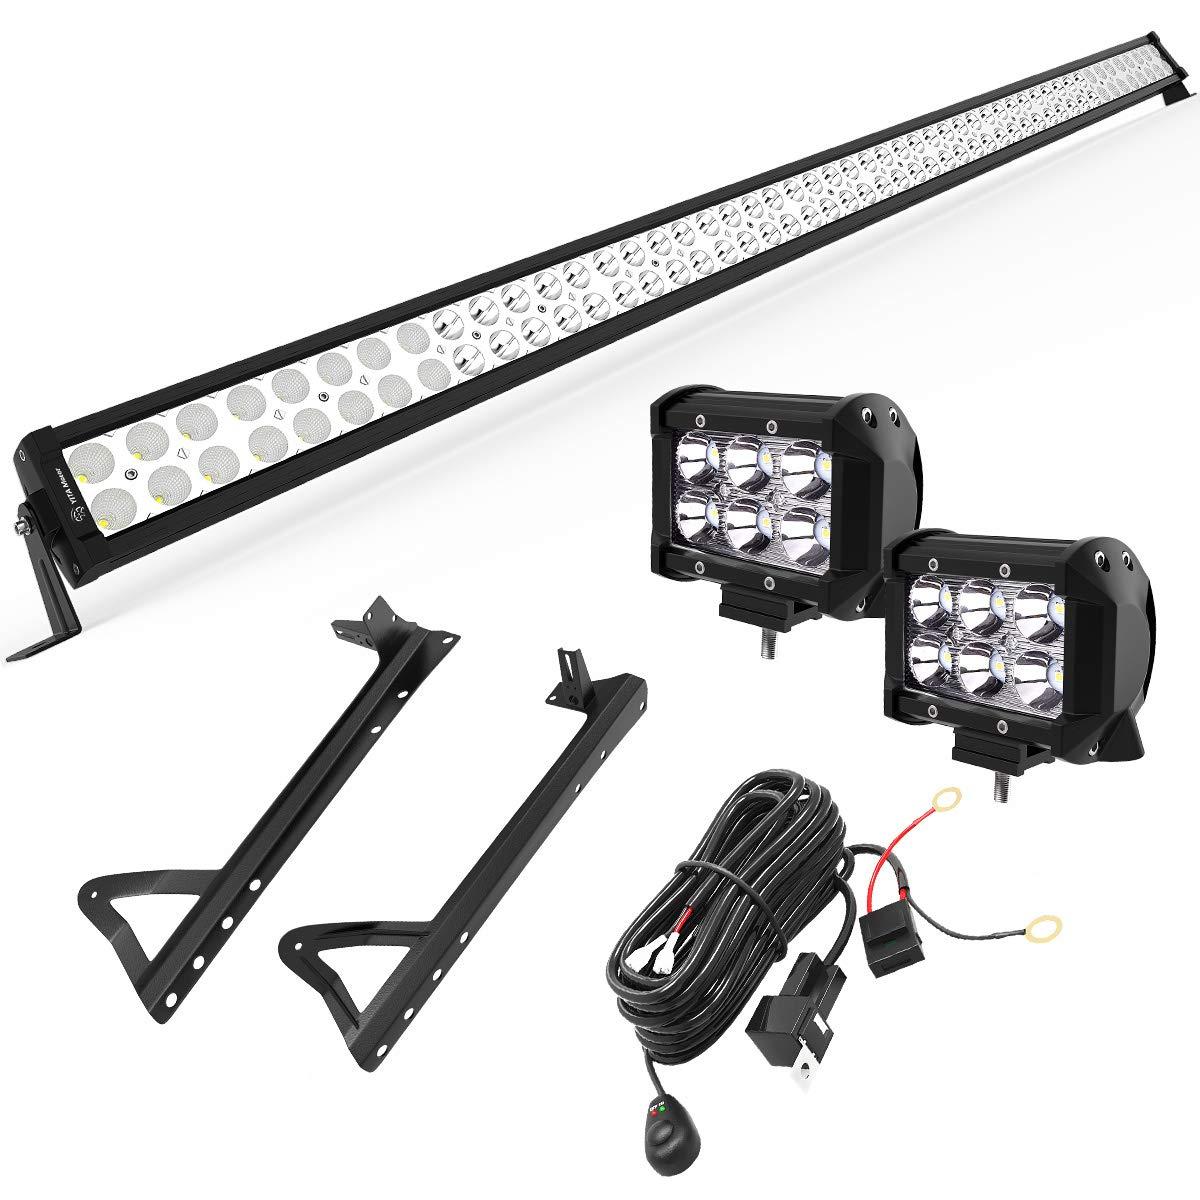 "Yitamotor 52"" 300W Combo LED Light Bar}"